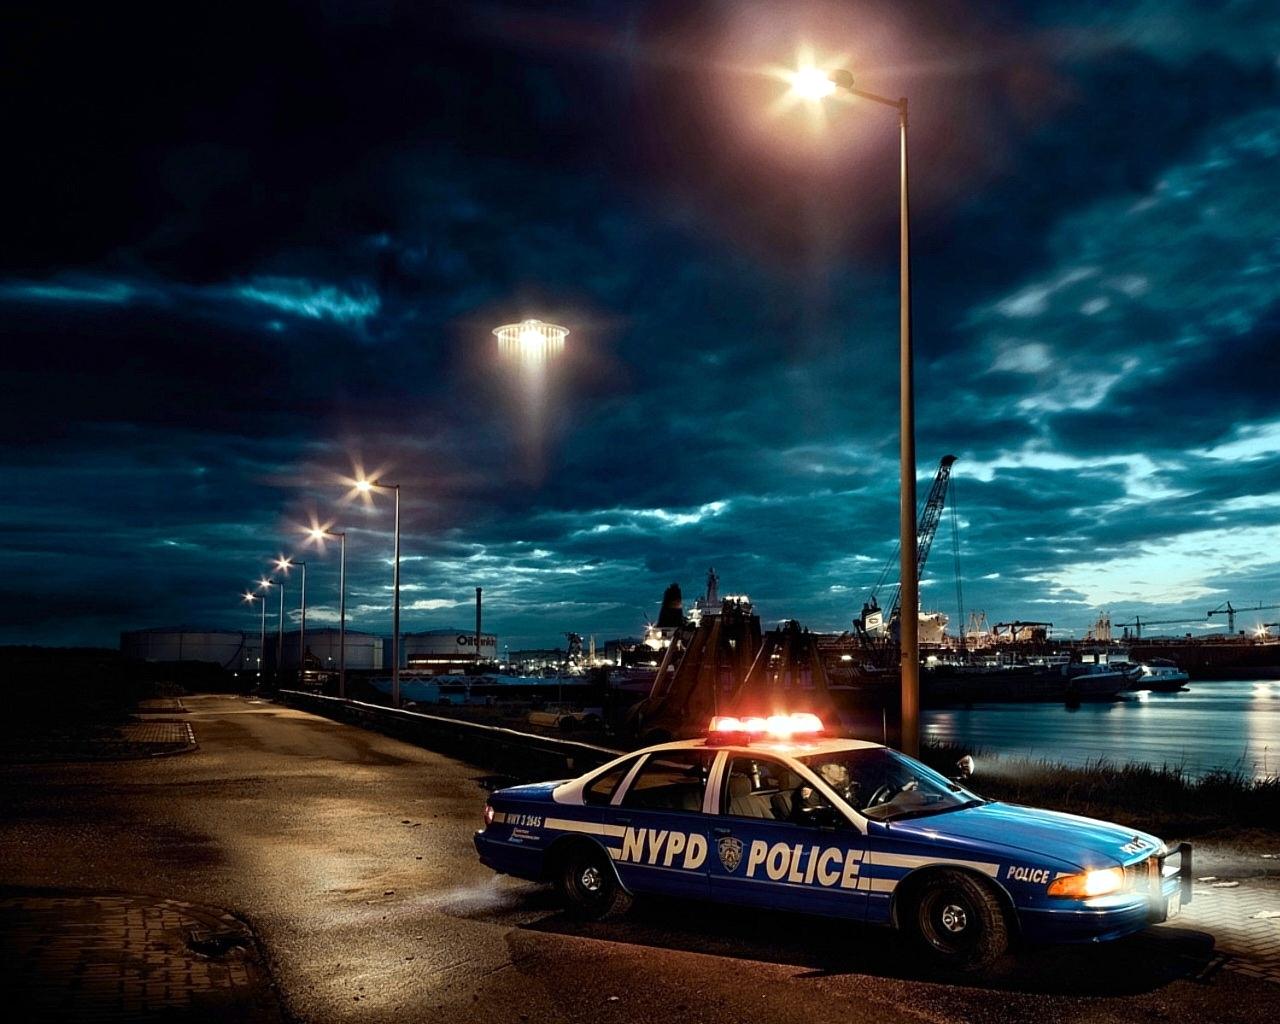 Police Car Wallpaper Police Car at Night 1280x1024